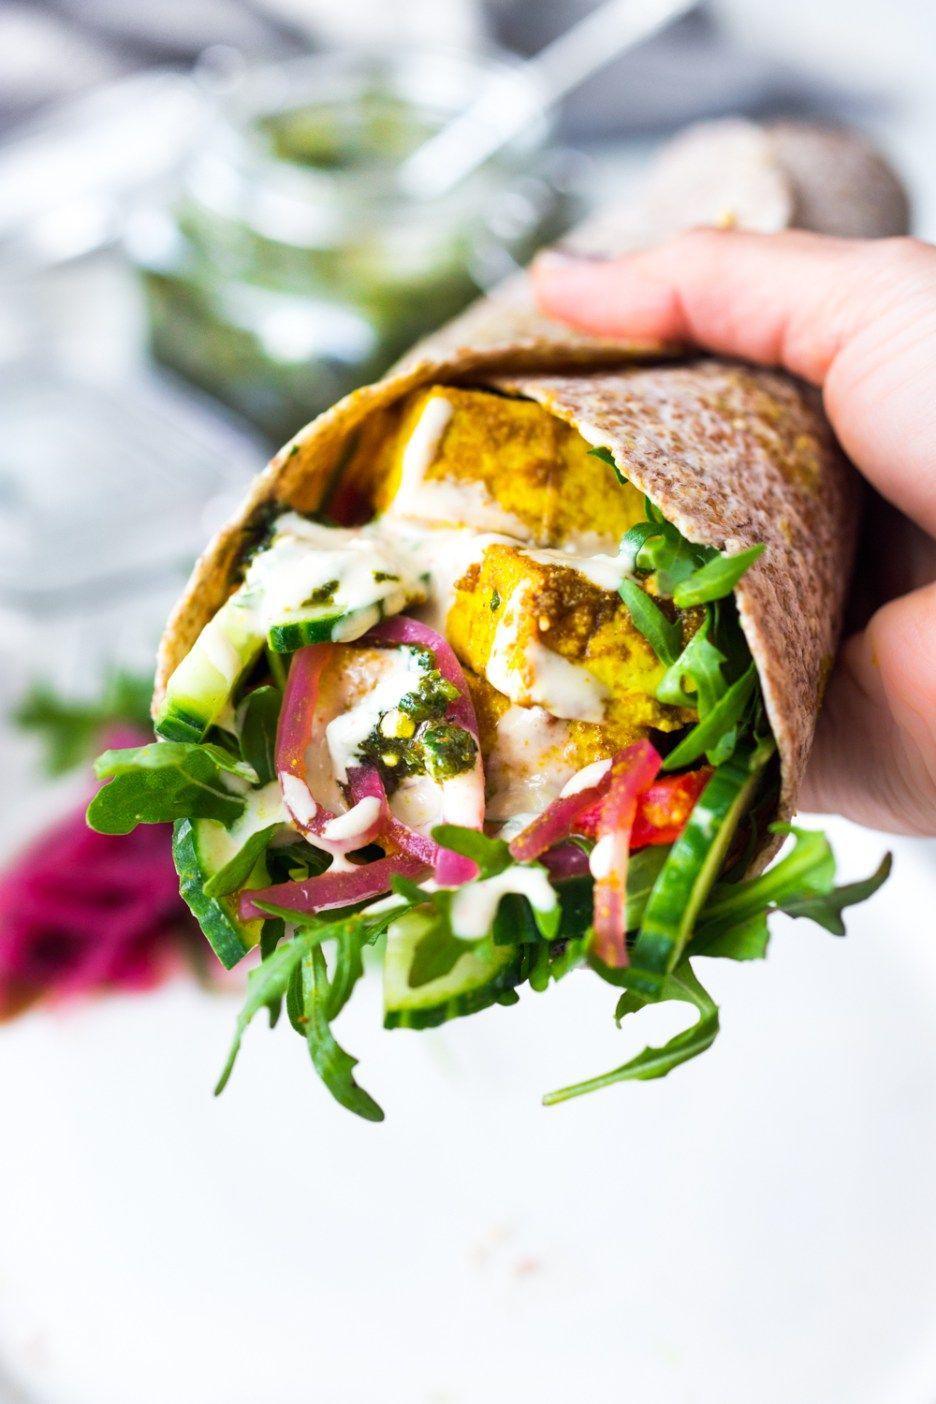 Shawarma Kana